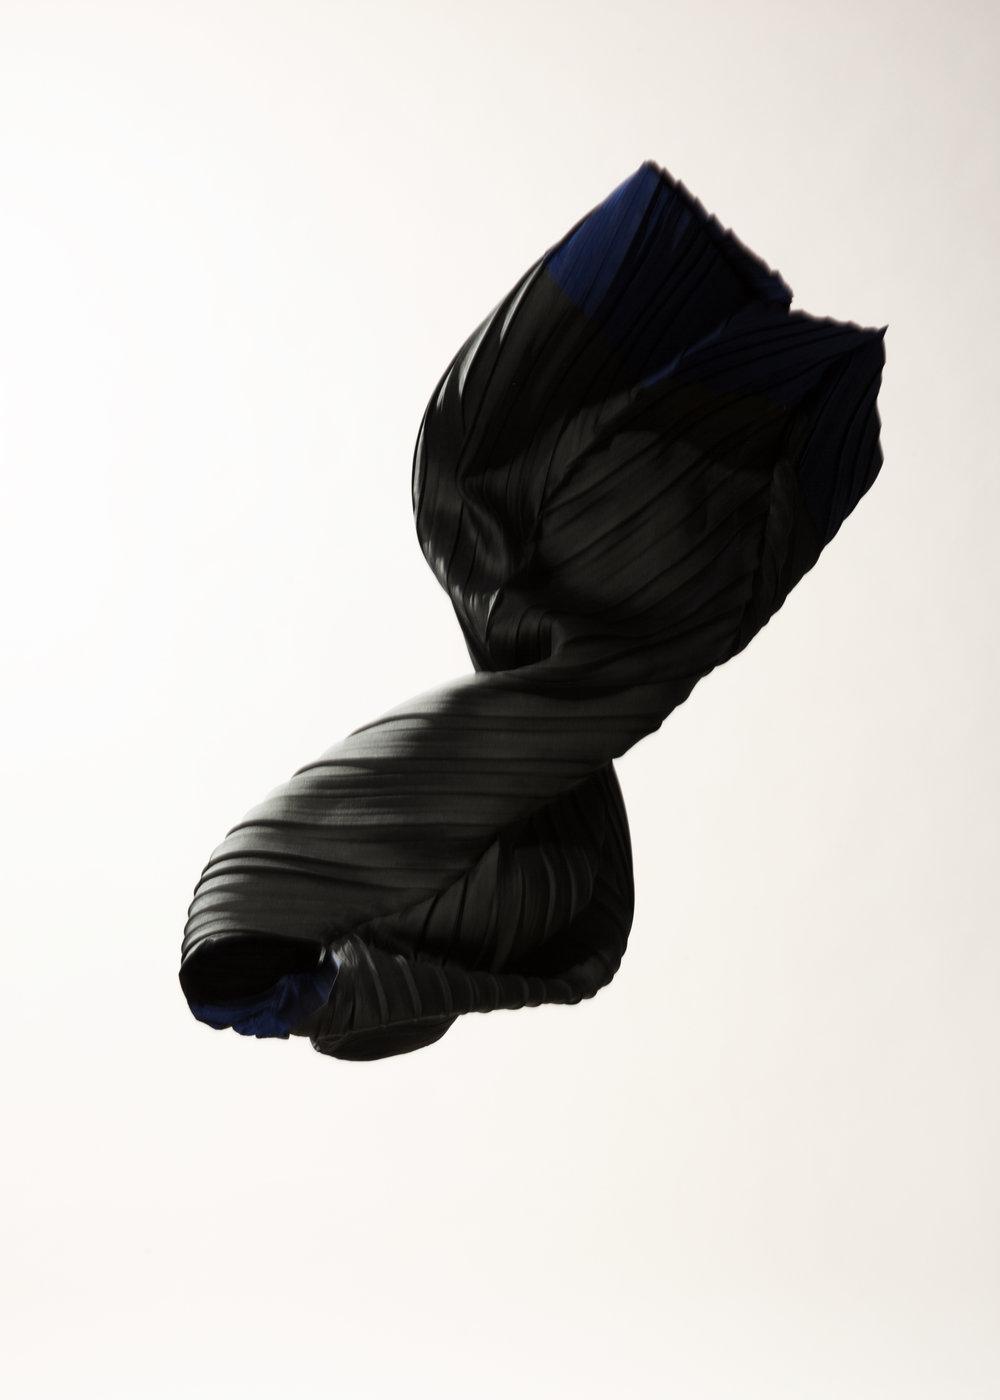 Totokaelo-FabricStory-6.jpg